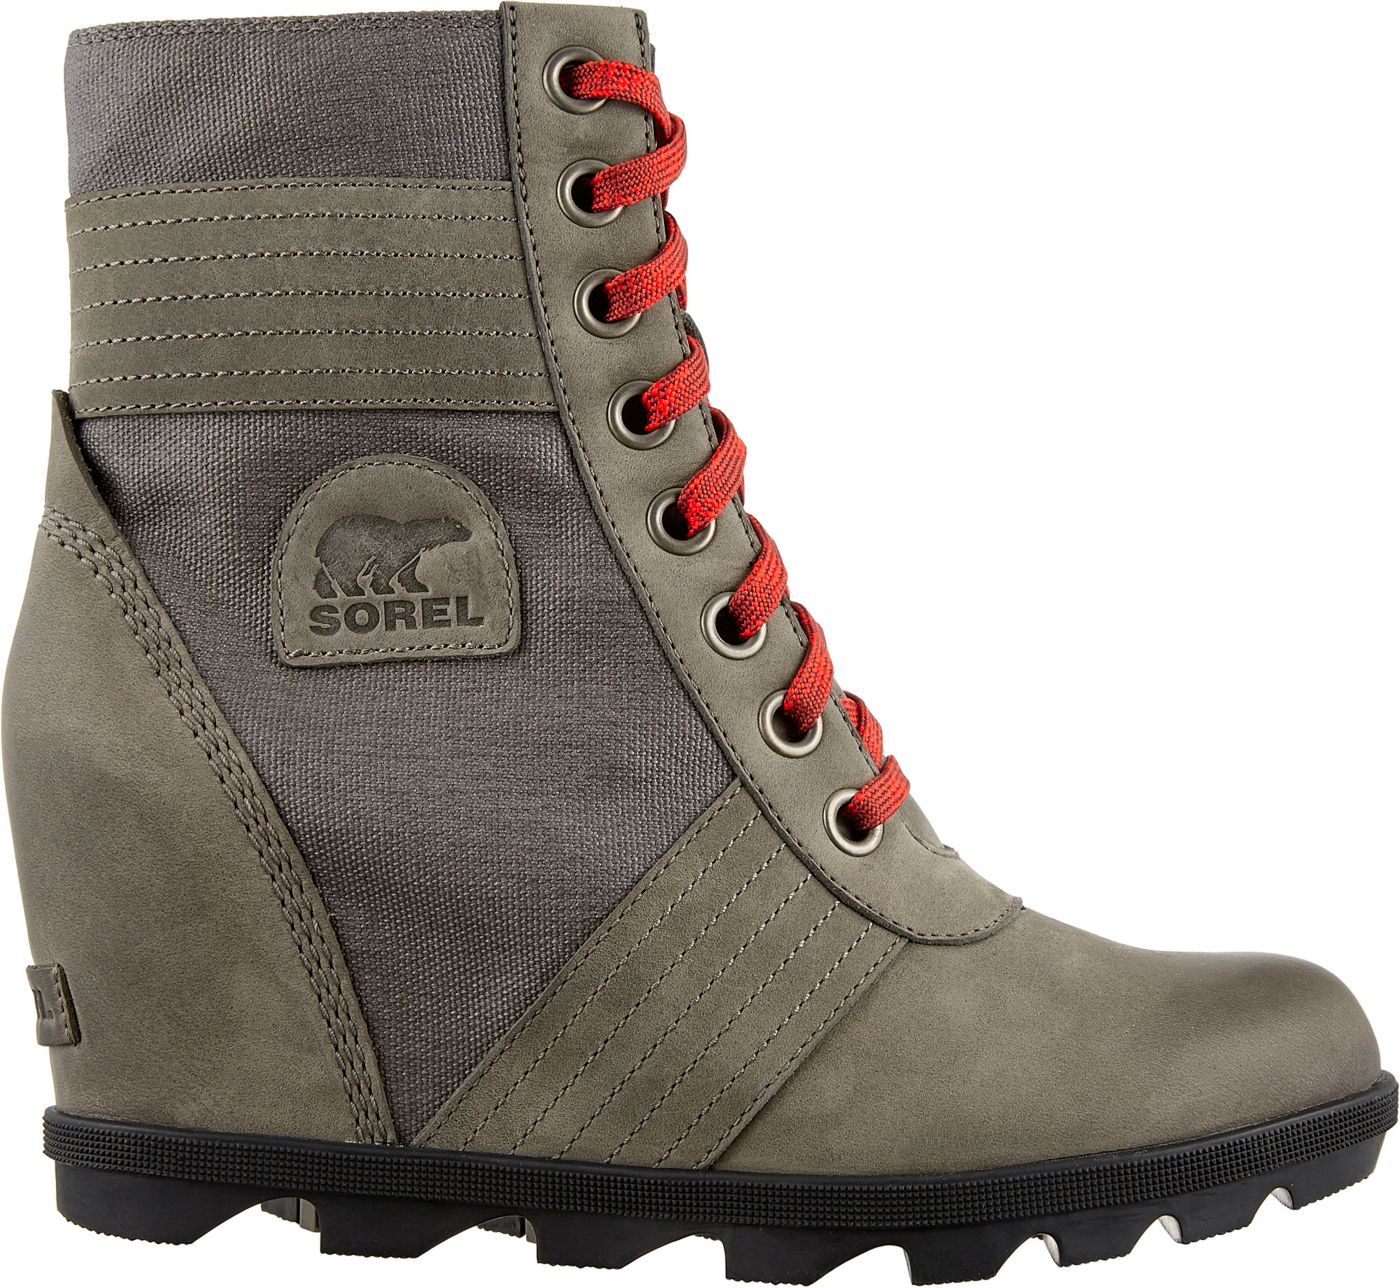 SOREL Women's Lexie Wedge Casual Boots